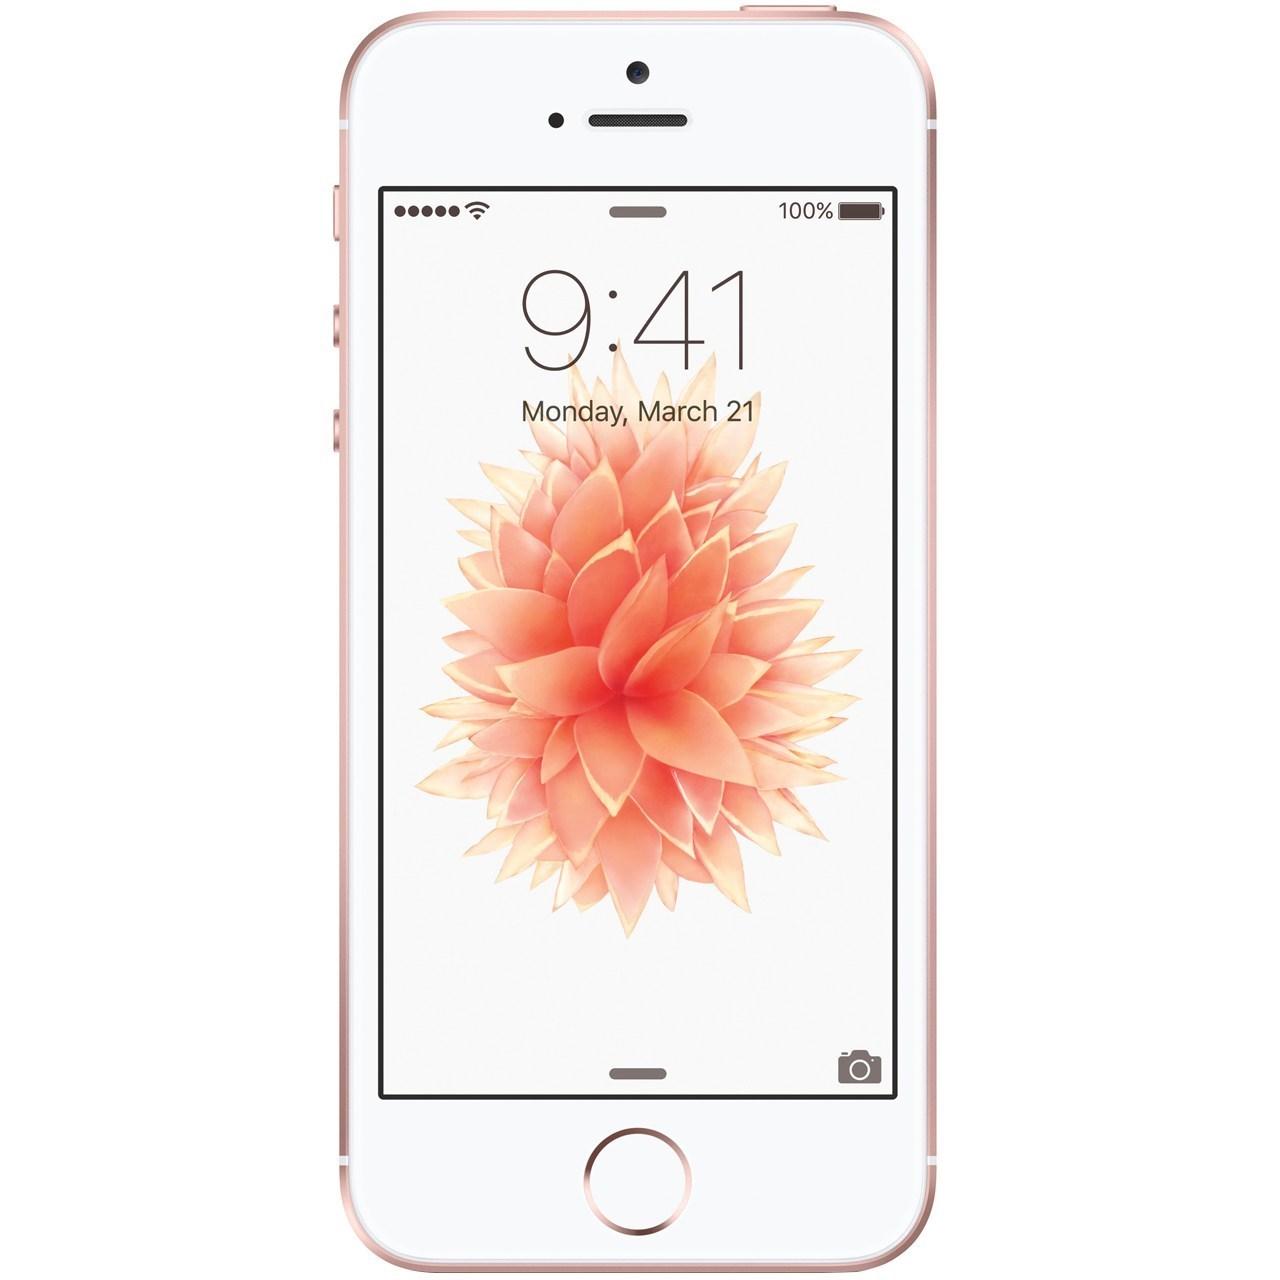 گوشی موبایل اپل مدل iPhone SE ظرفیت 32 گیگابایت                             Apple iPhone SE 32GB Mobile Phone